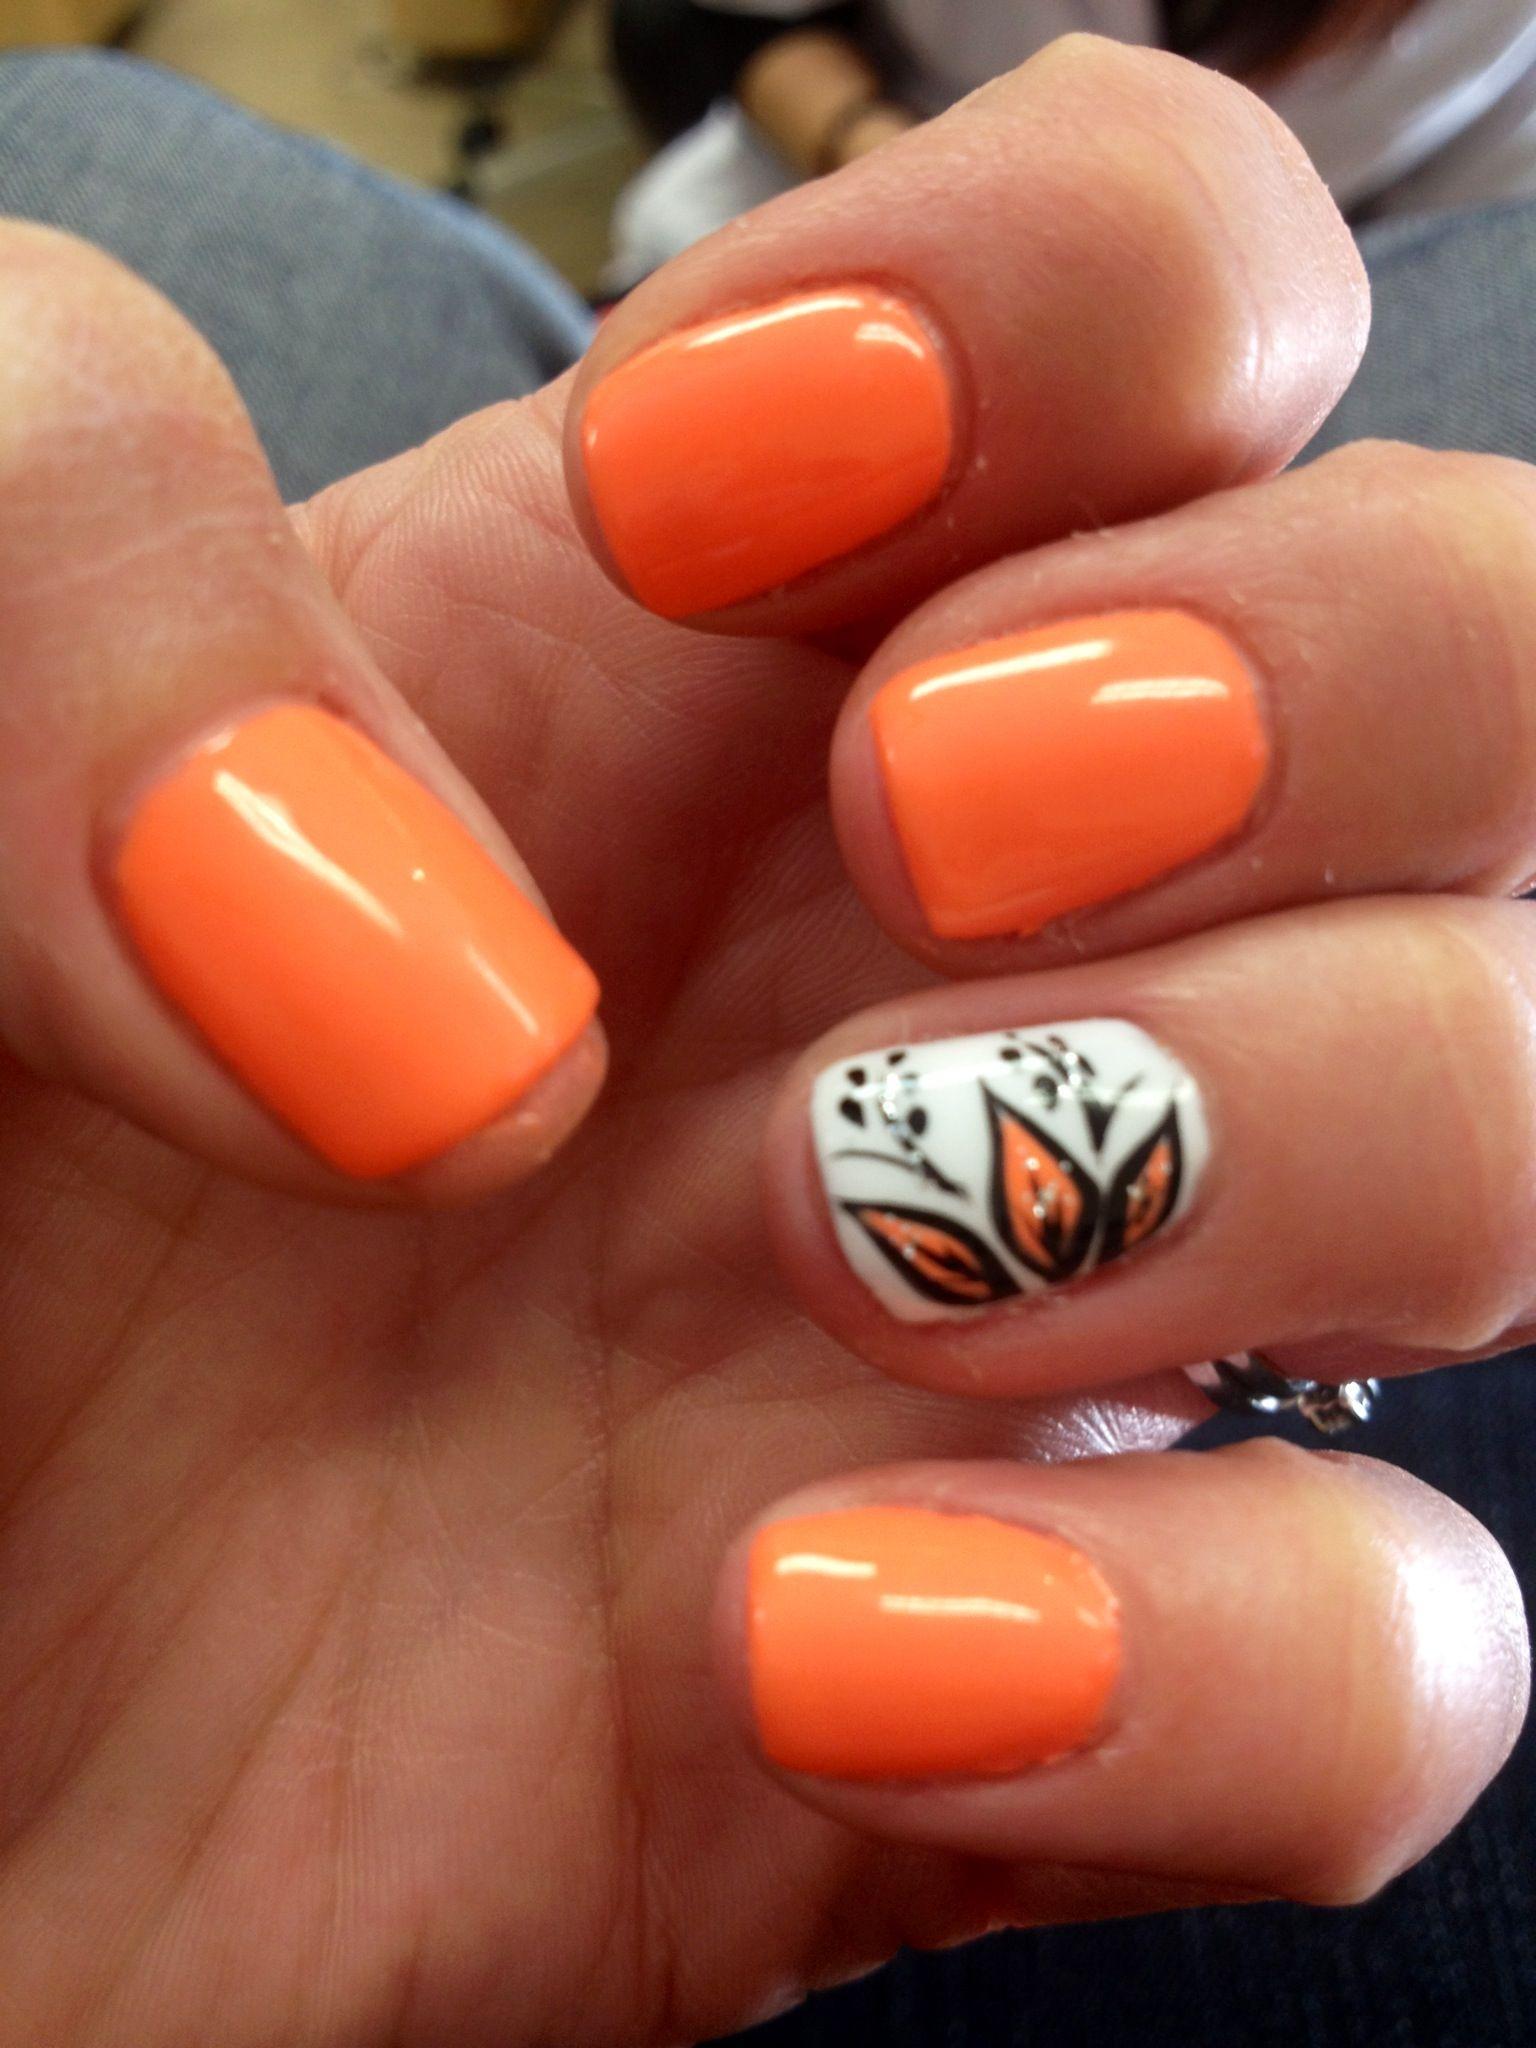 Nail Art, cute nails, nail design, shellac, gellish, summer nail designs,  flower design, nails, - 33 Earthy And Stylish Fall Nail Art Ideas Nail'd It Pinterest